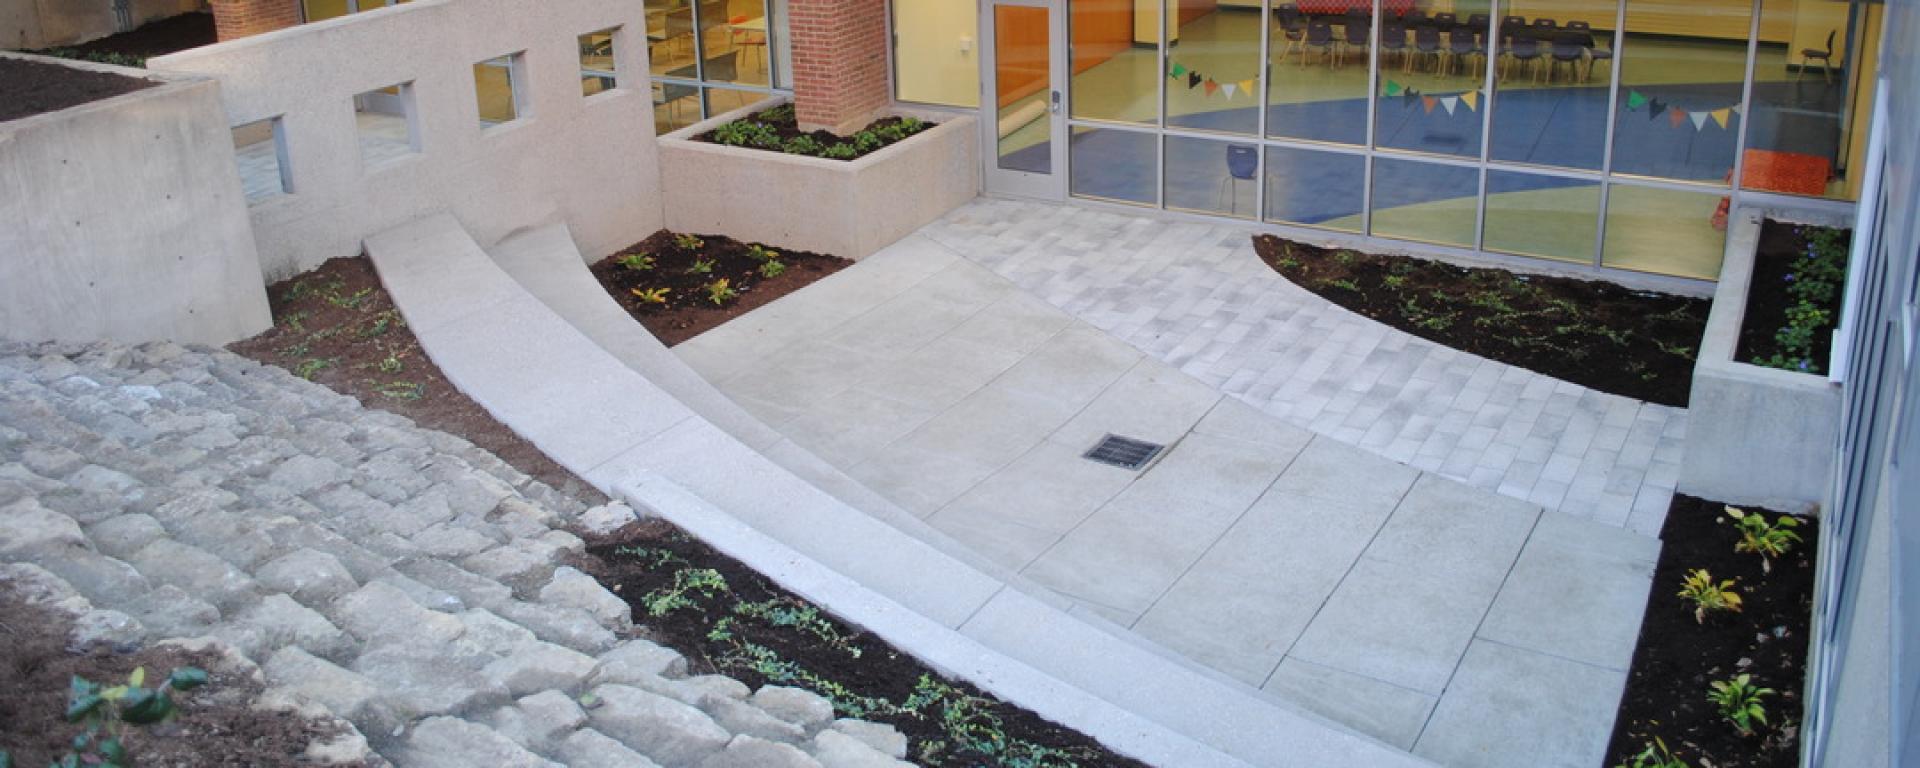 Courtyard inside Kenton County Public Library